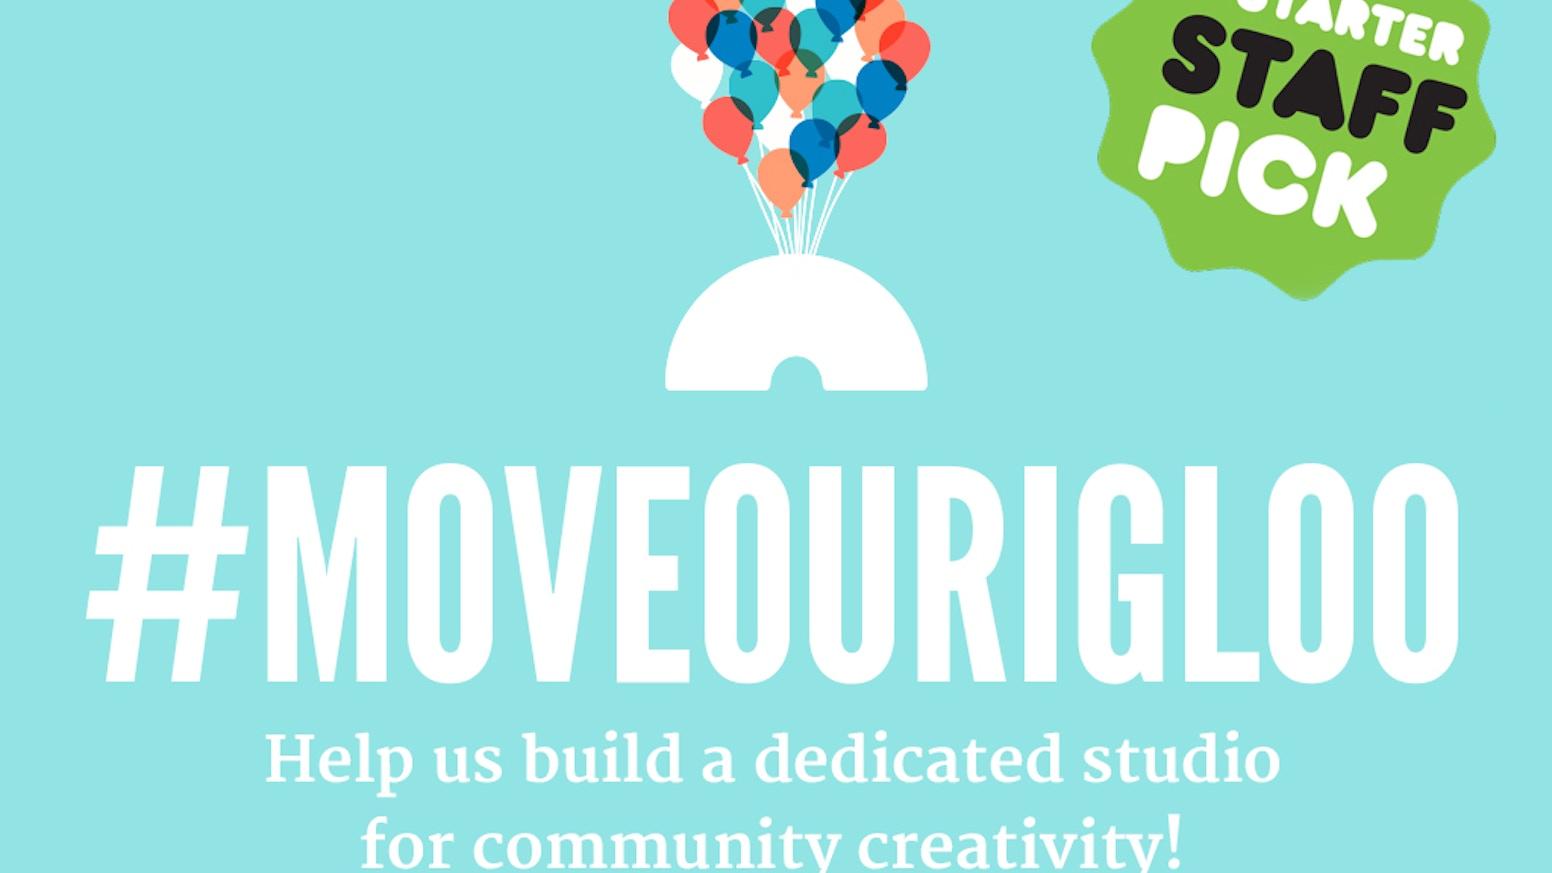 Move Our Igloo: Create a Studio for Community Creativity by Igloo ...